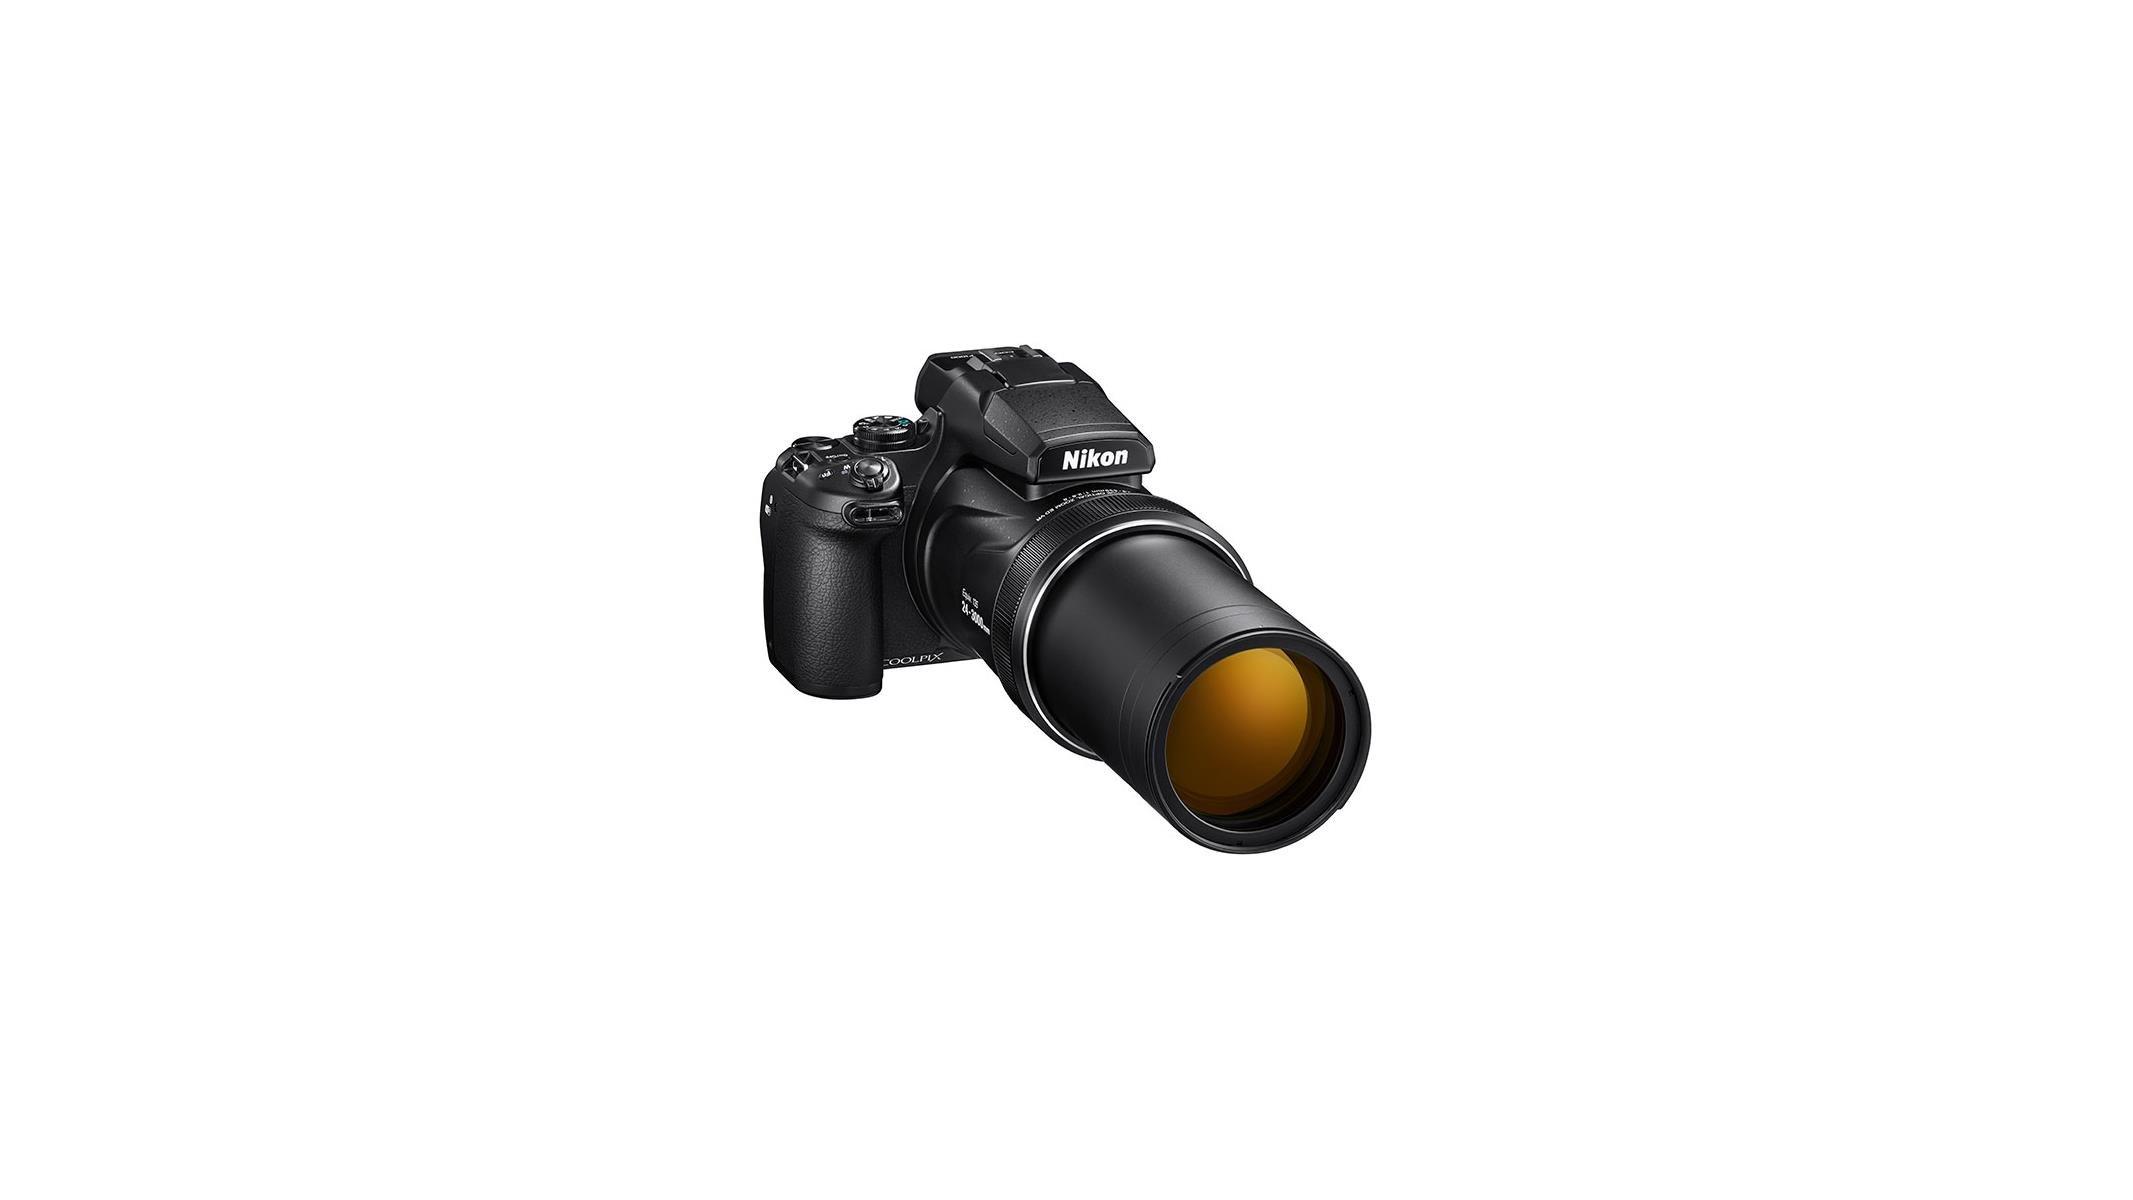 Nikon Coolpix P1000 Announced With Hulk Smashing 125x Superzoom Lens